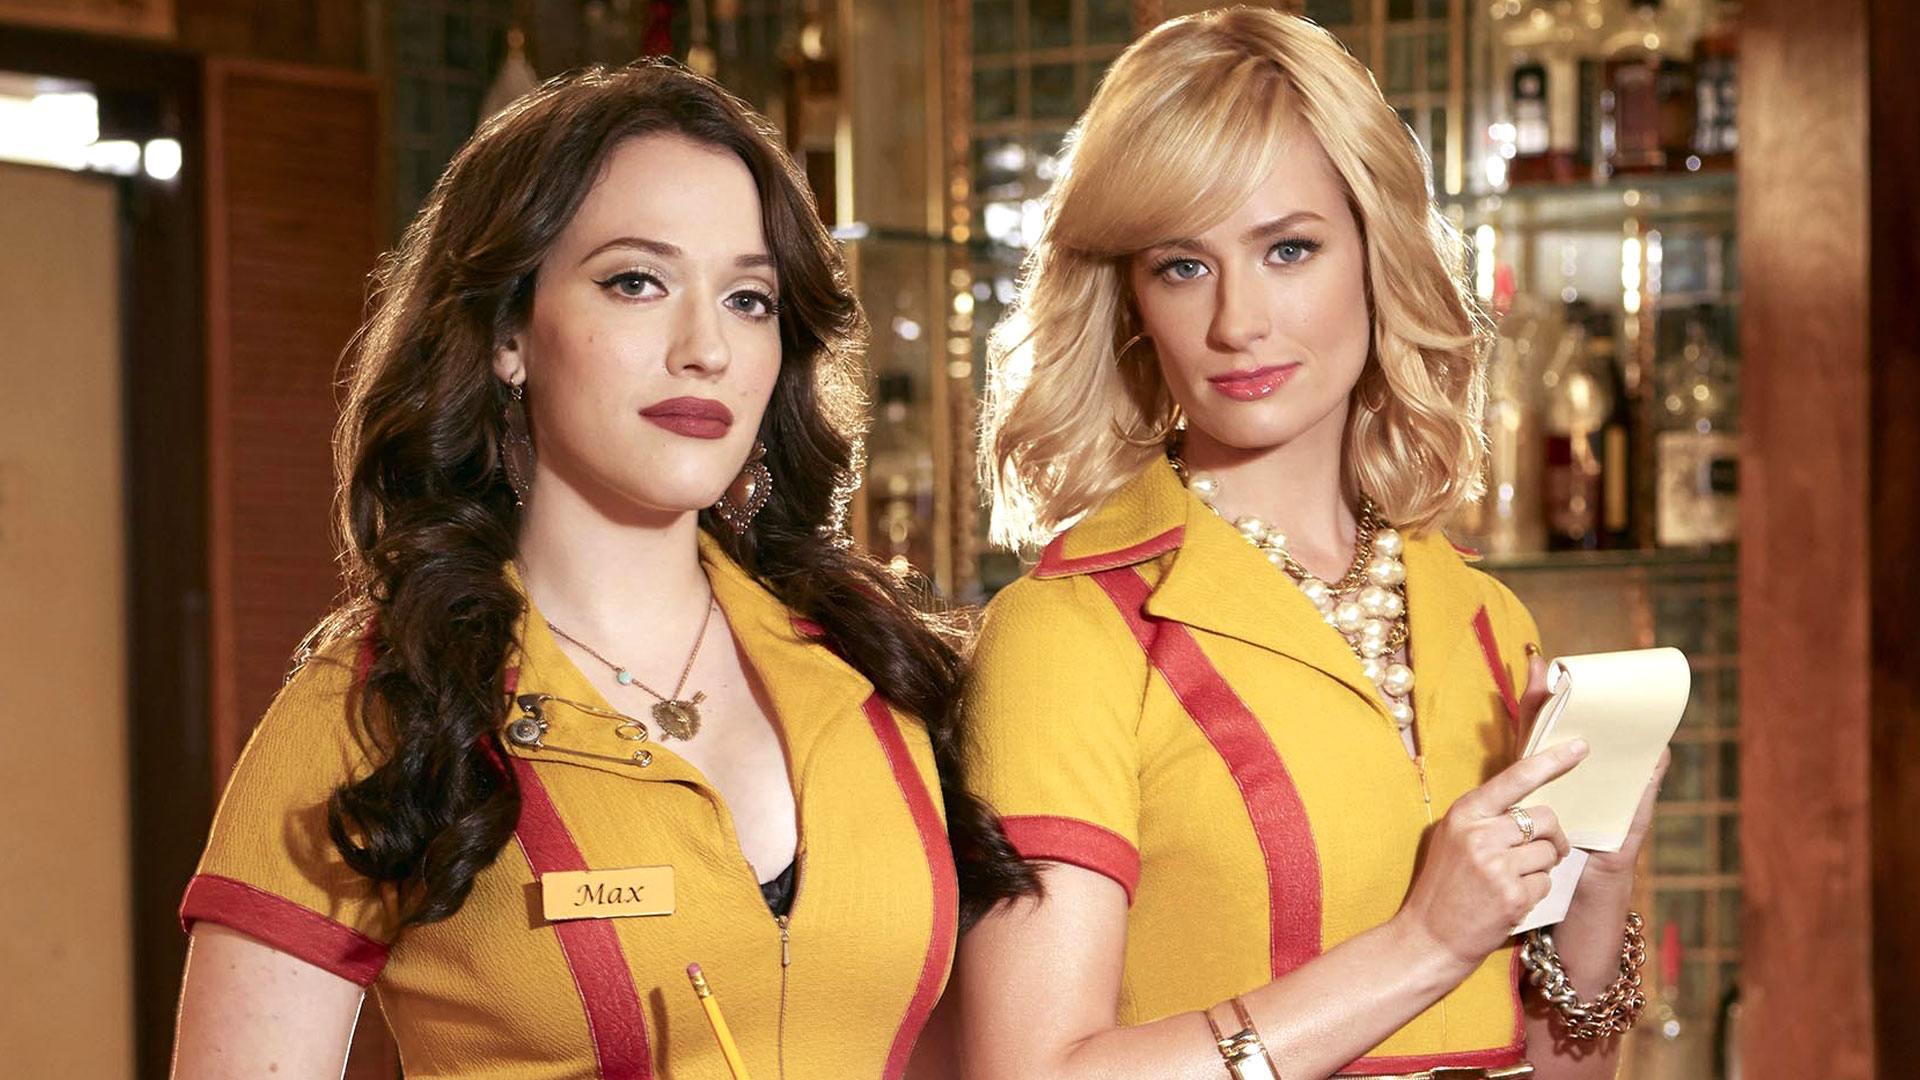 Kat Dennings and Beth Behrs wear waitress uniforms in 2 Broke Girls